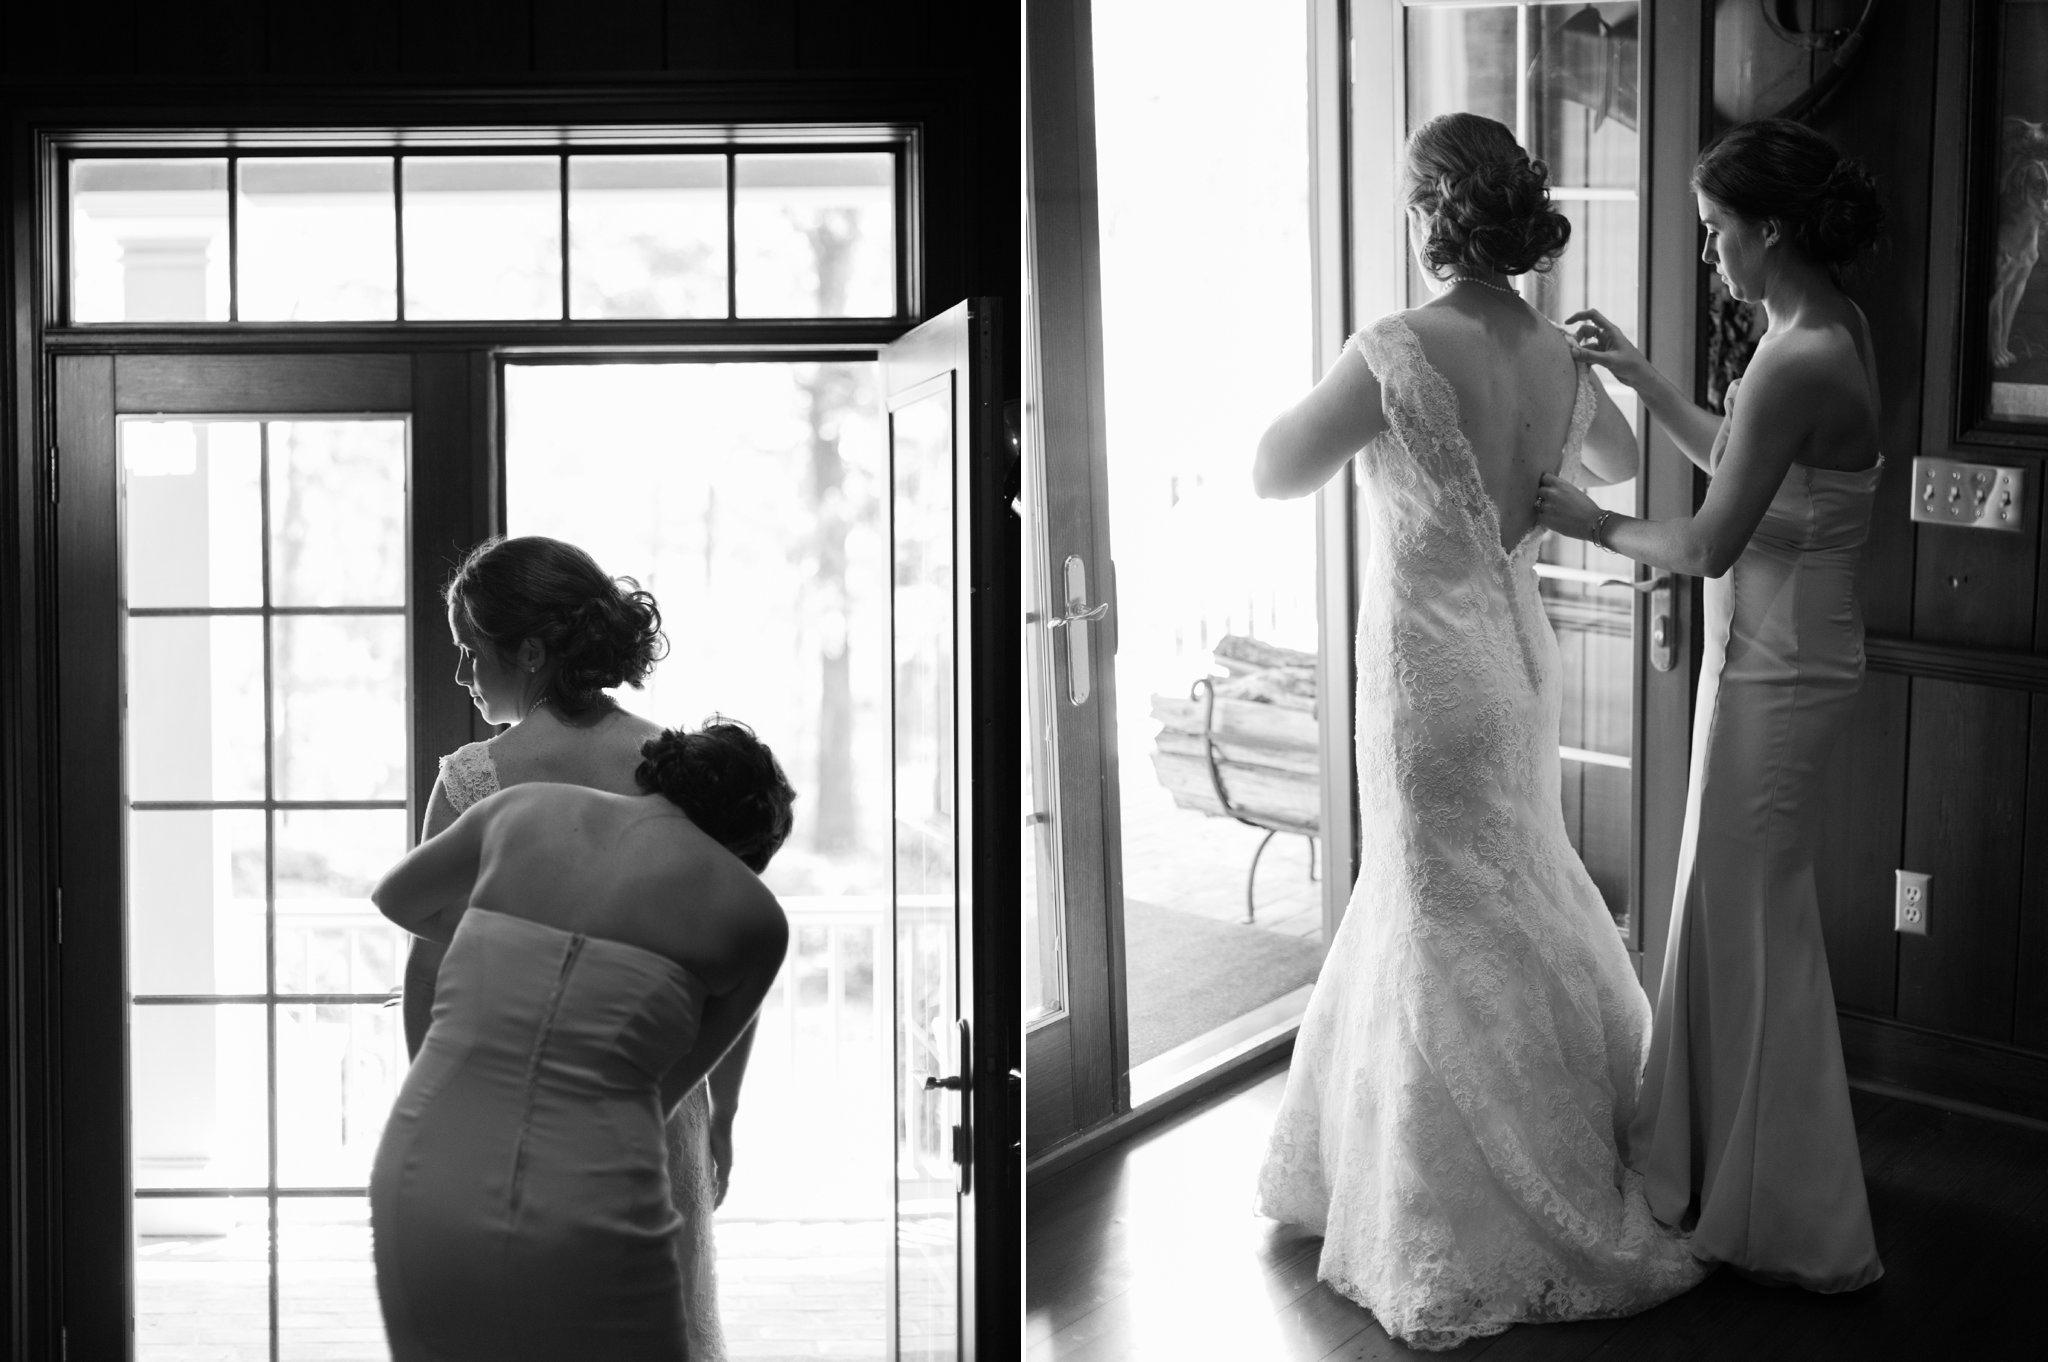 ecila farm wedding albany georgia wedding photographer shannon griffin photography-1.jpg